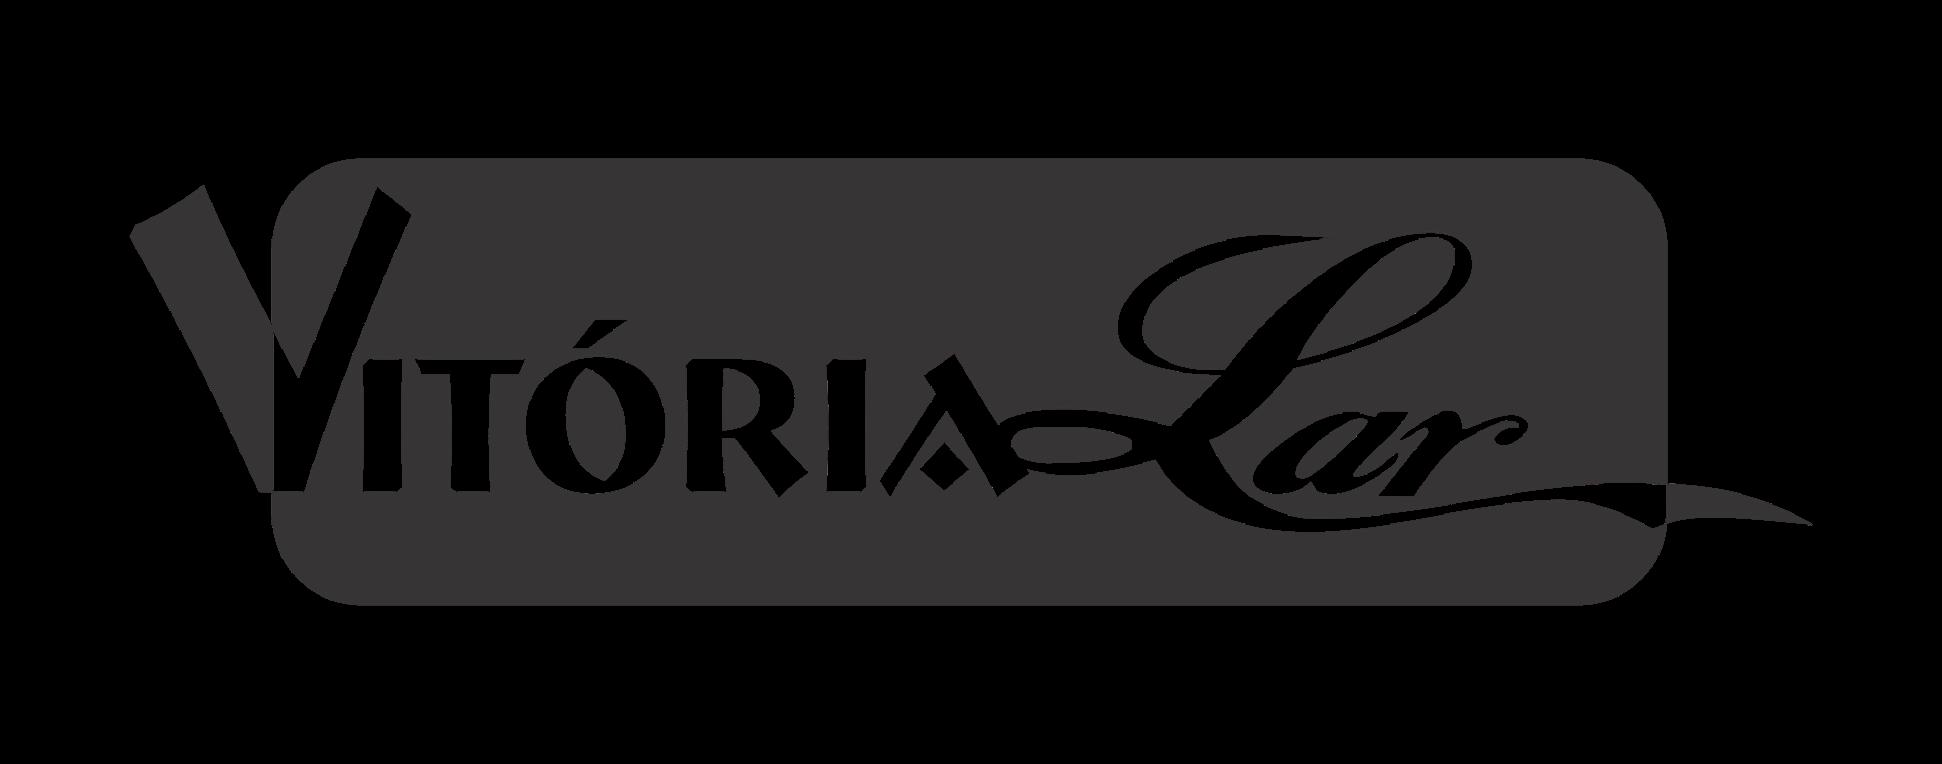 Vitória Lar